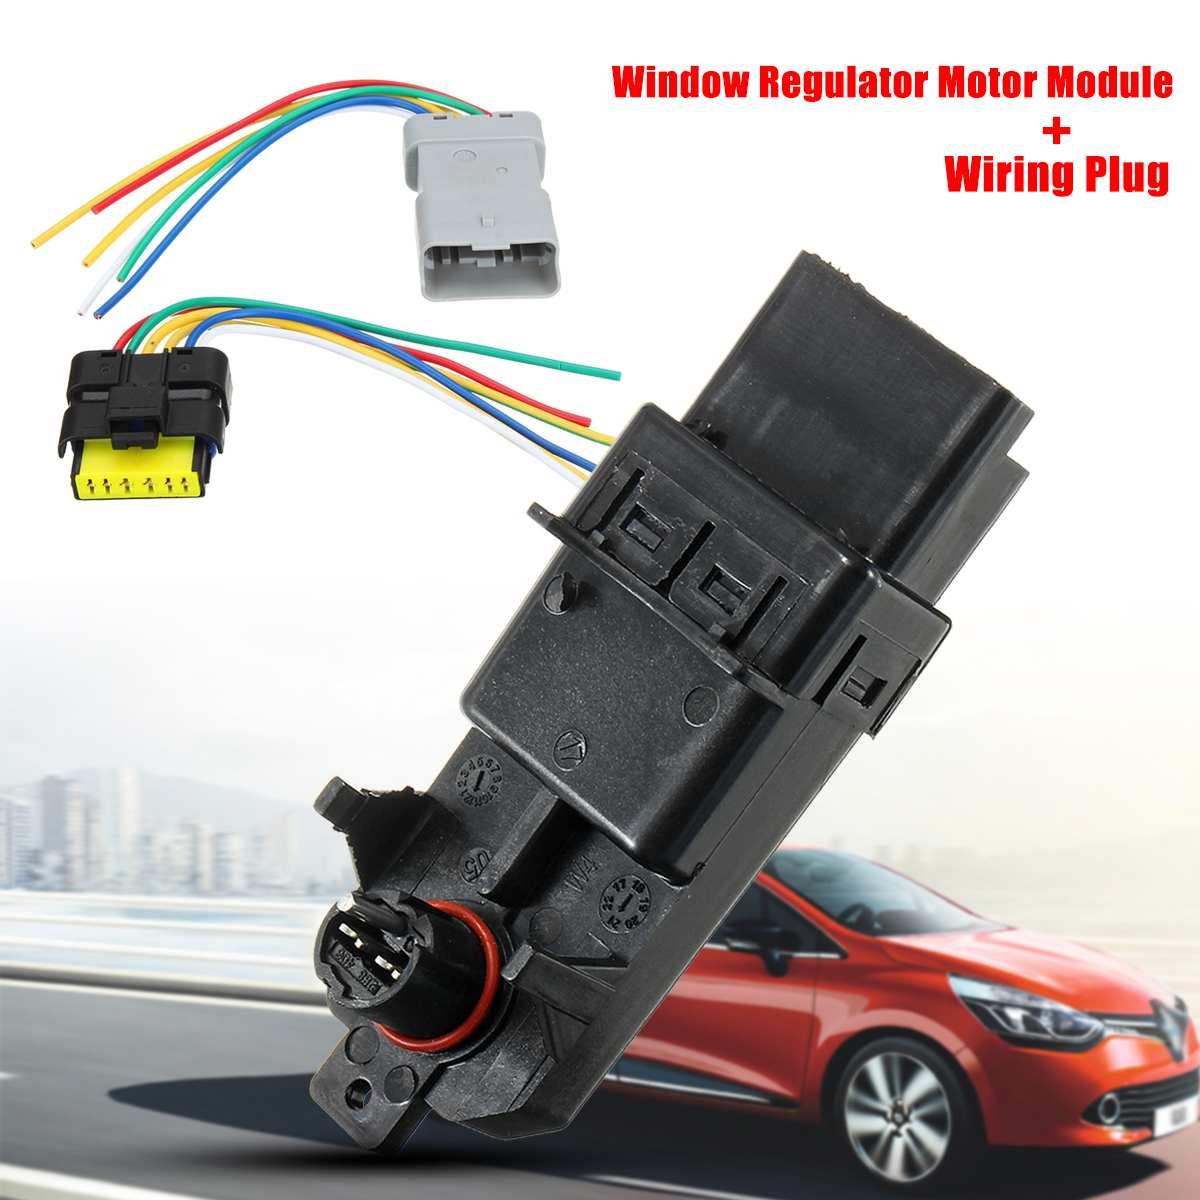 Módulo regulador elevador de ventana eléctrico para coche, módulo regulador de cableado, arnés de enchufe para Renault Clio/Espace/Grand Scenic/Megane/Scenic